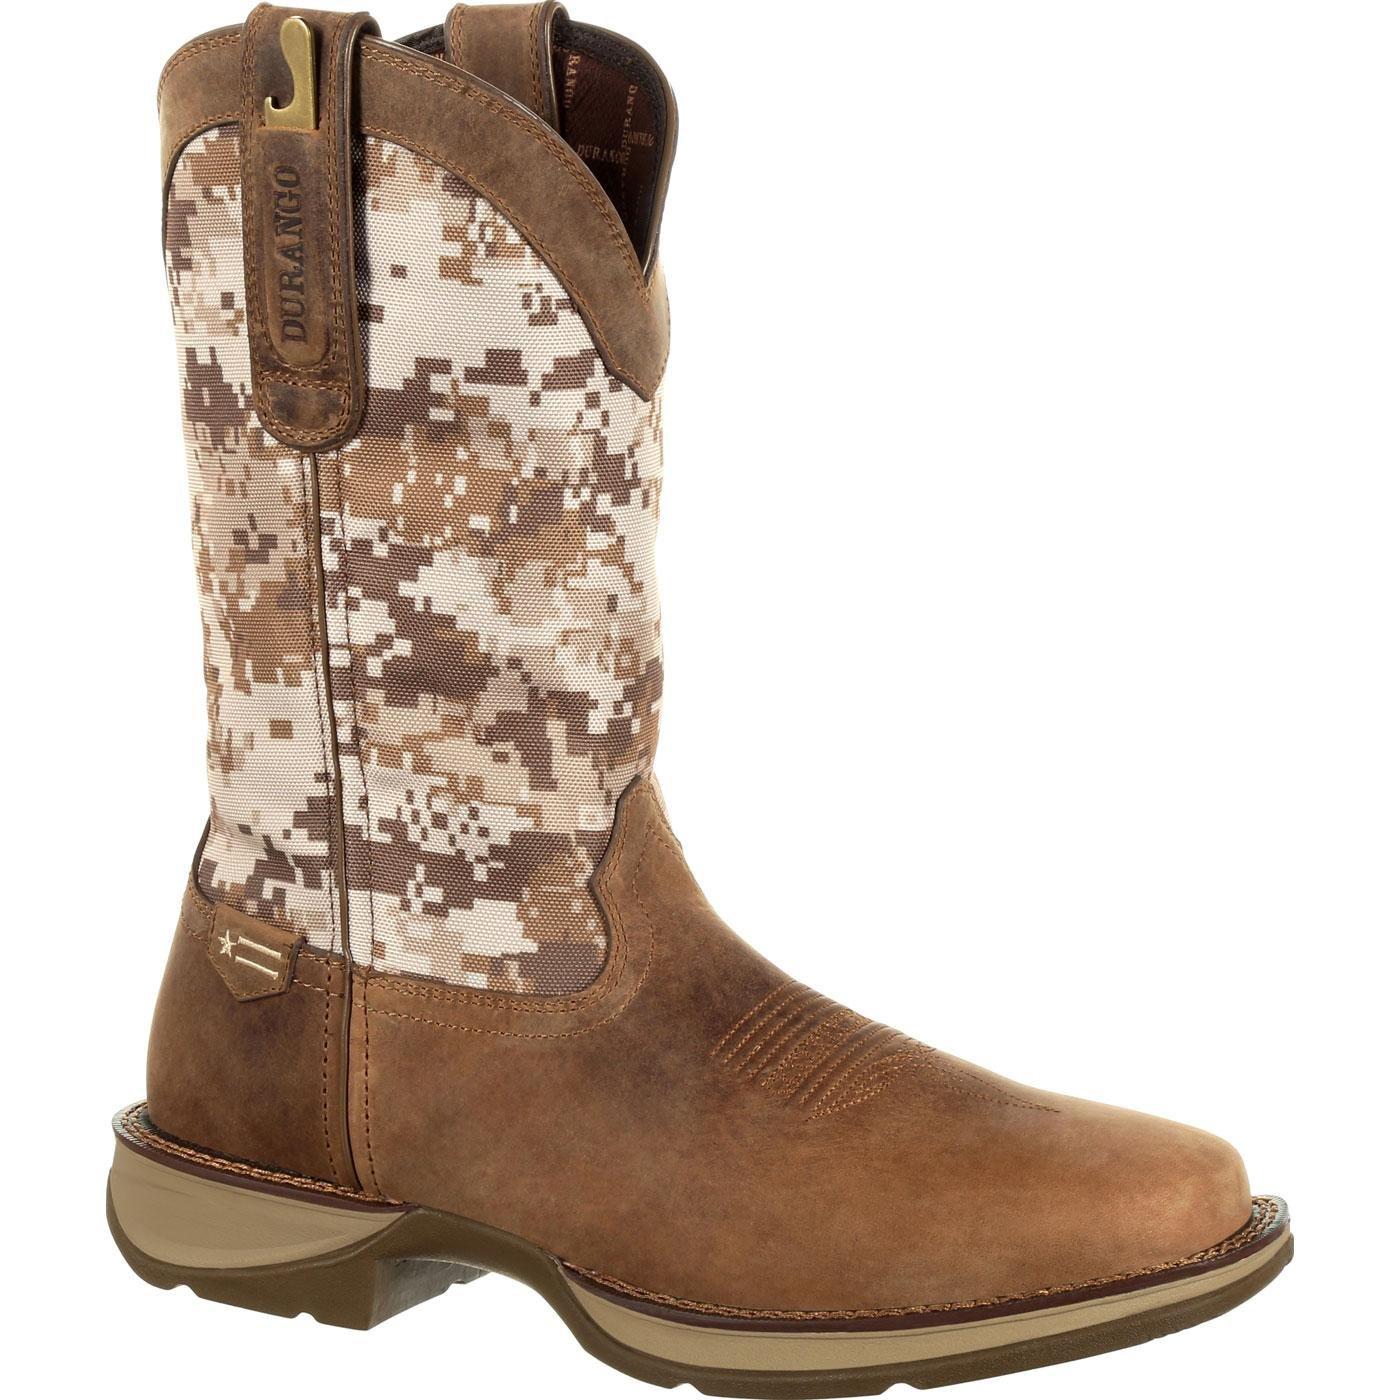 Durango Men's Rebel by Desert Camo Western Boot Square Toe - Ddb0166 ROCKY BRANDS INC